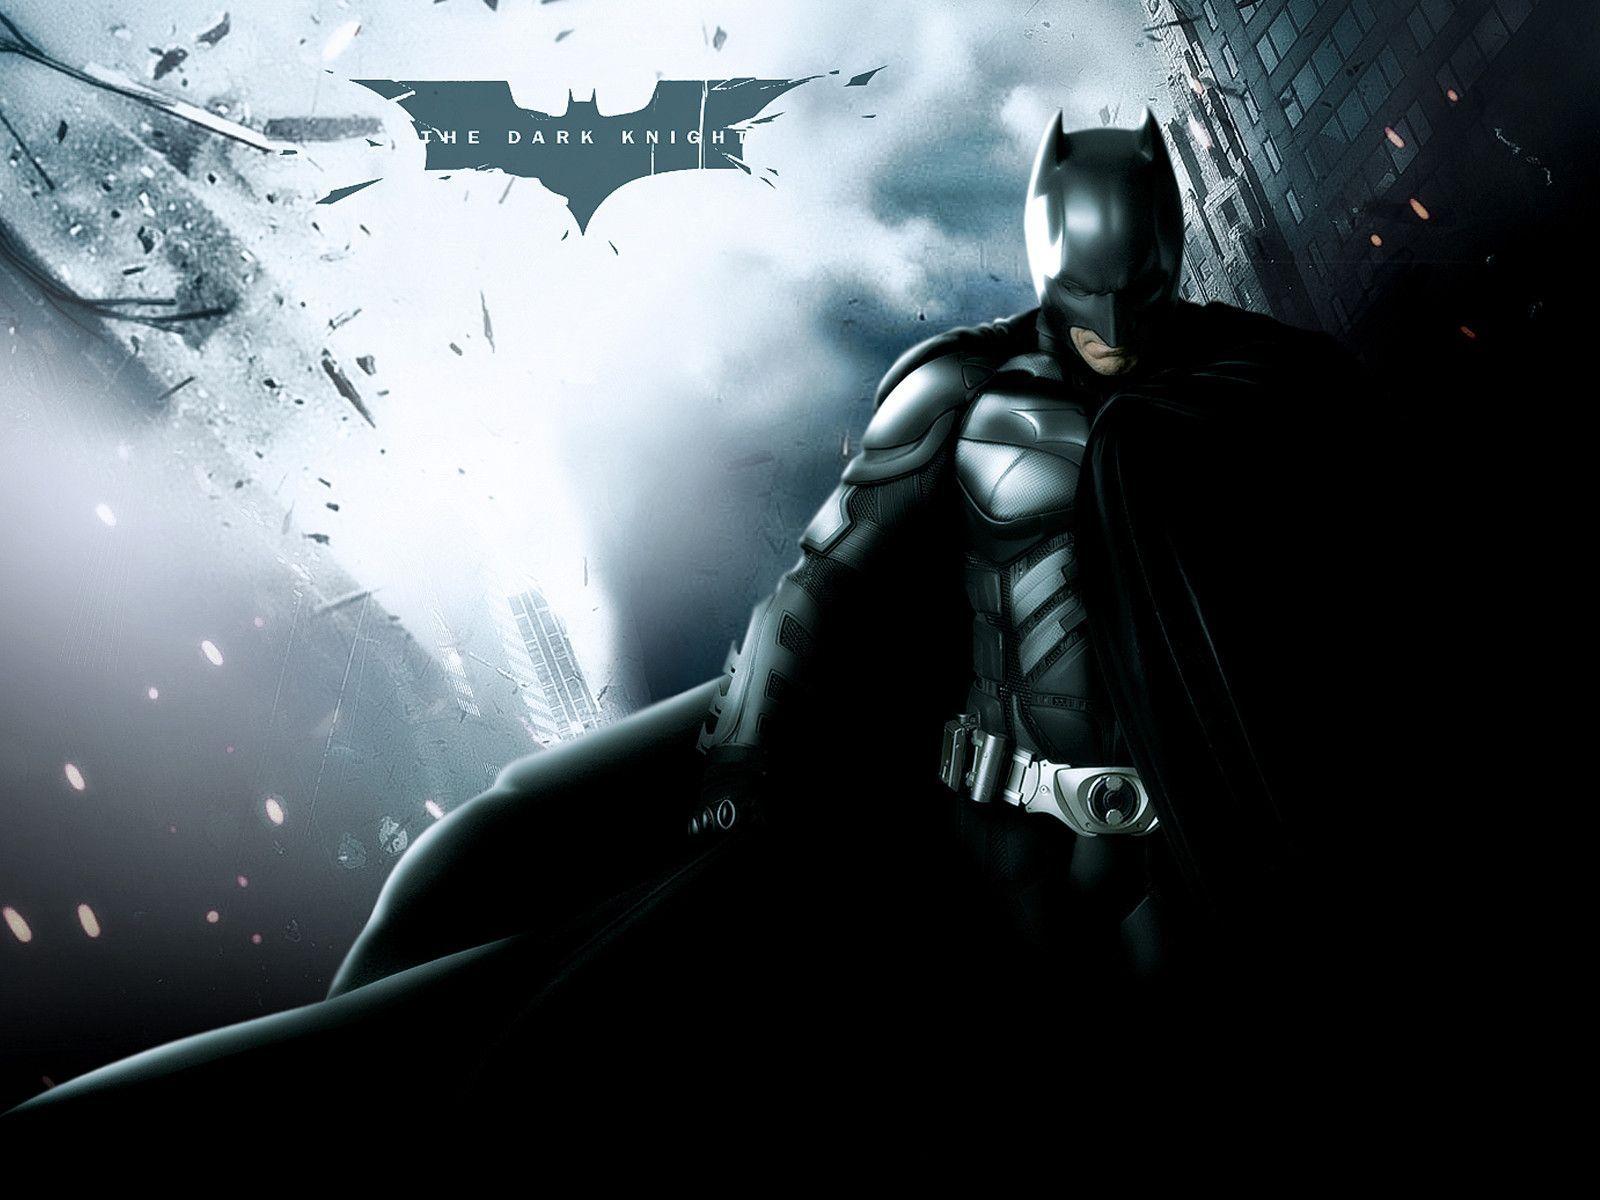 Dark Knight Wallpaper 1600×1200 The Dark Knight Wallpapers